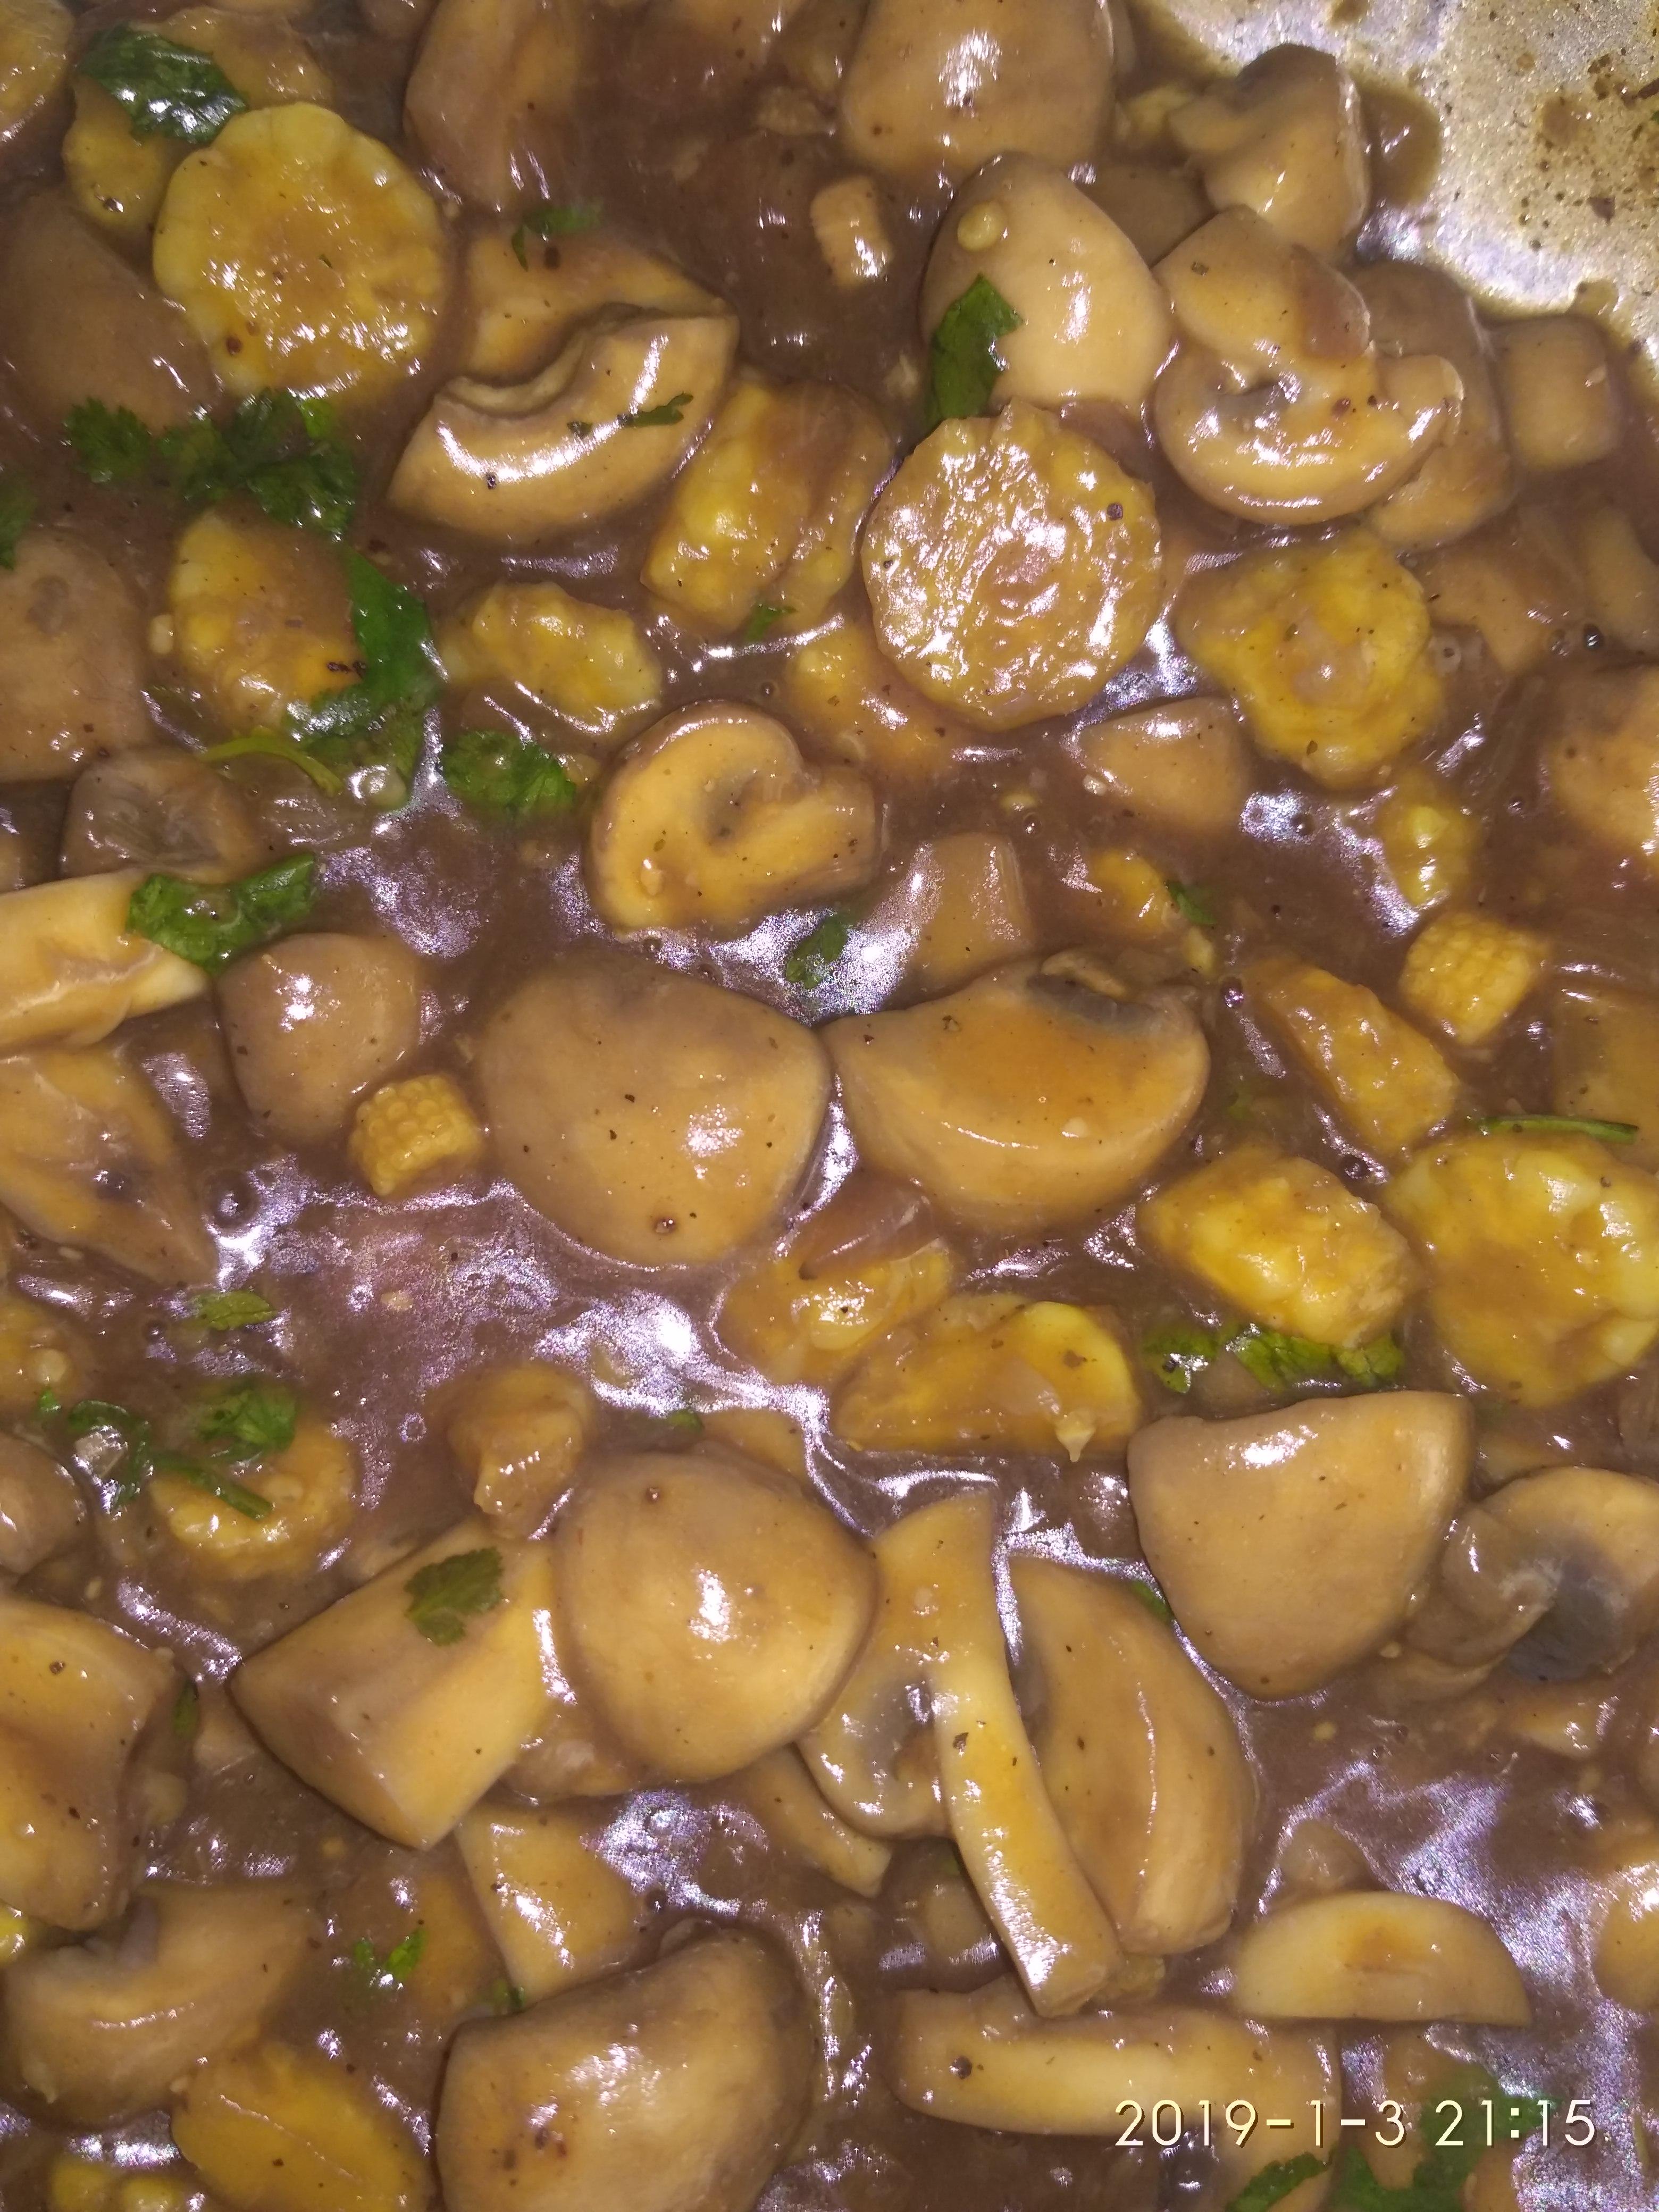 Stir-Fried Mushrooms with Baby Corn Gagandeep Kaur